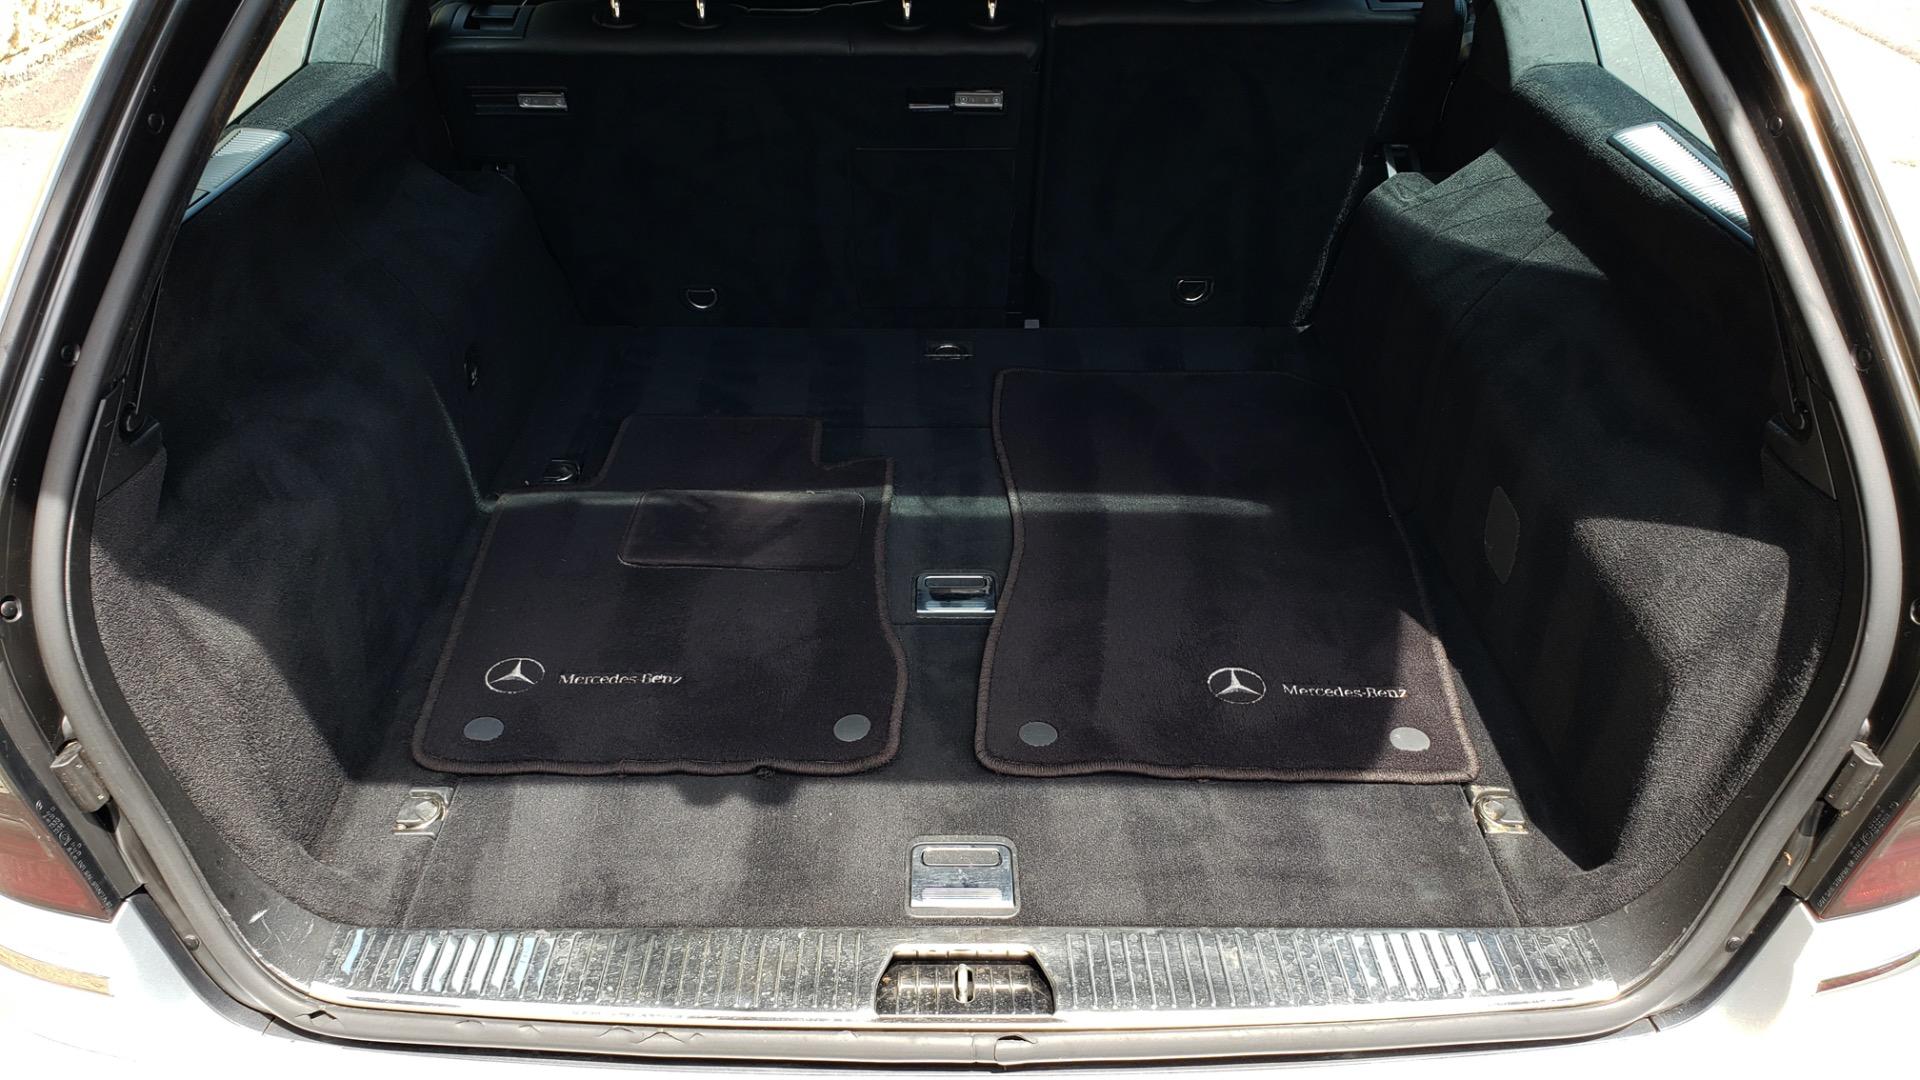 Used 2007 Mercedes-Benz E-Class E63 AMG WAGON / NAV / SUNROOF / HARMAN/KARDON for sale $29,000 at Formula Imports in Charlotte NC 28227 21